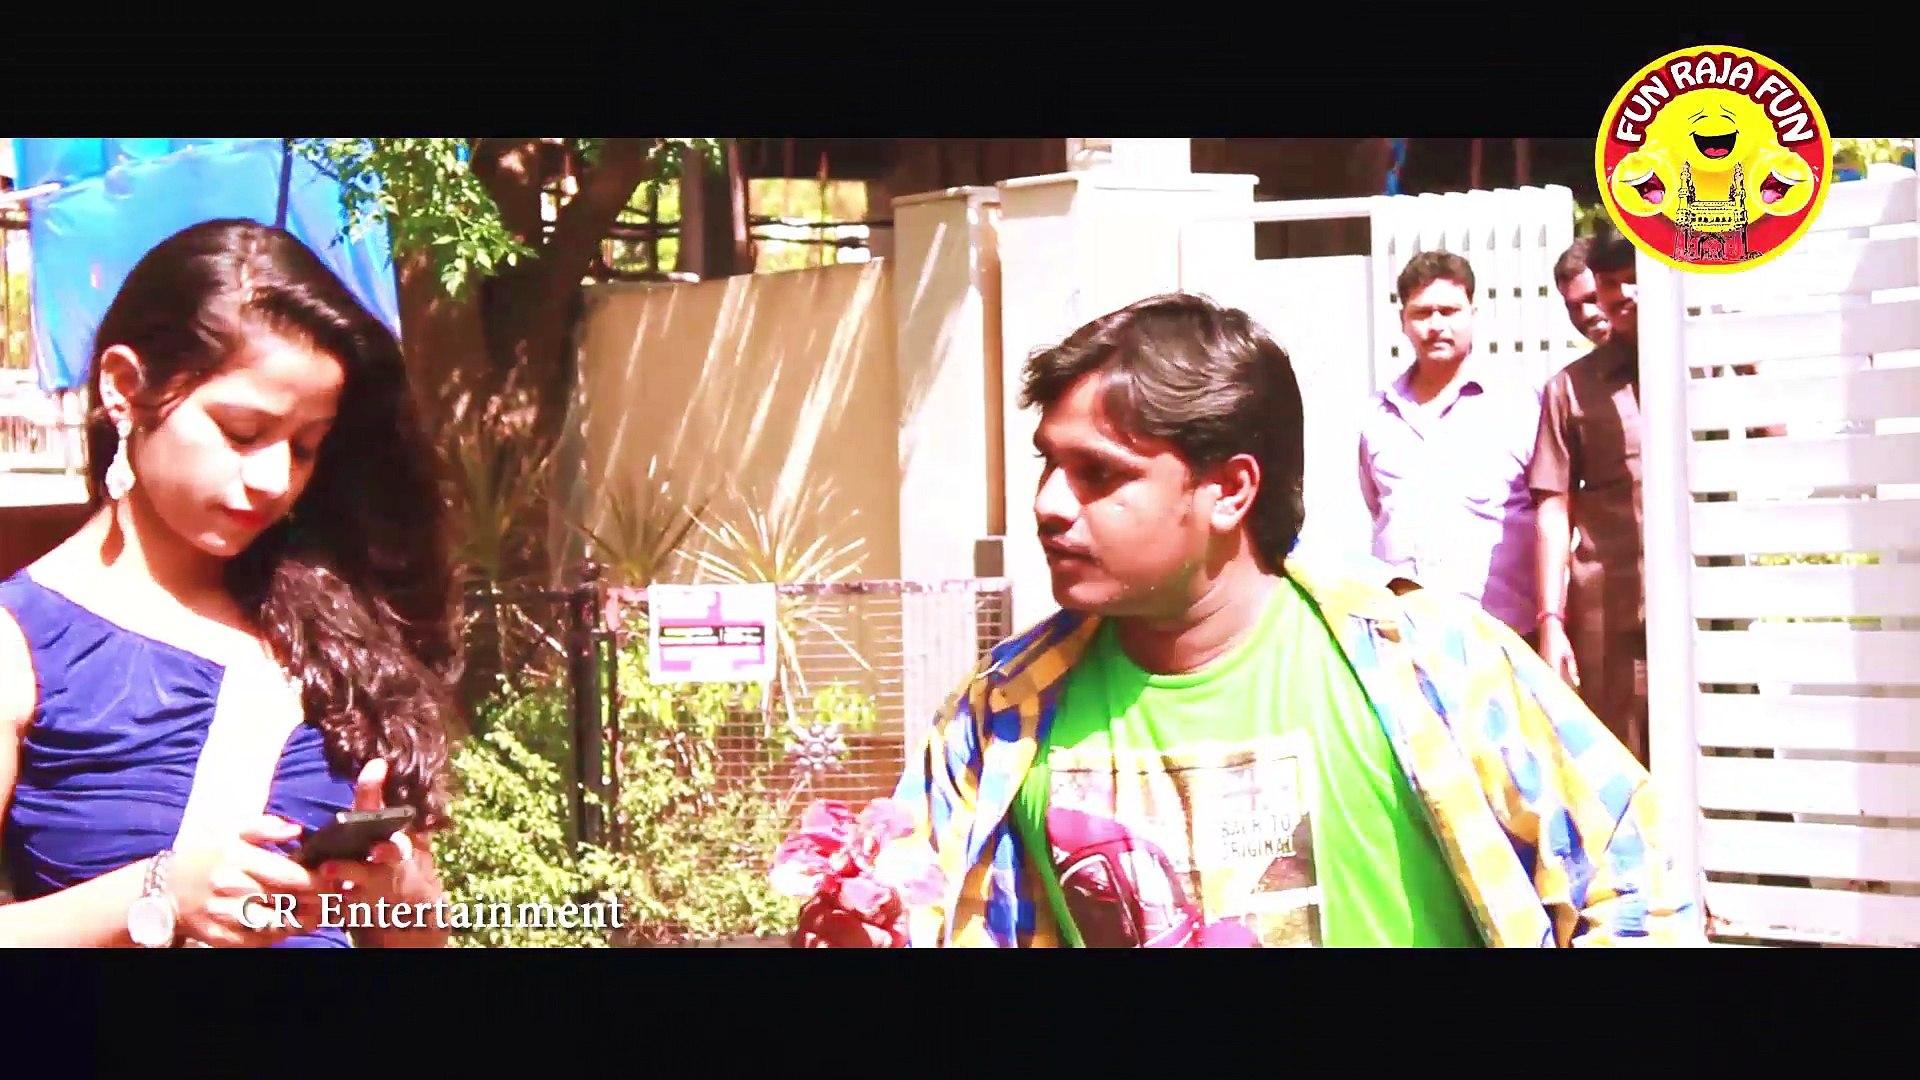 Fun Raja Fun ll Jeberdast Latest fun comedy ll Episode 2 By @ Sridhar Ambati...